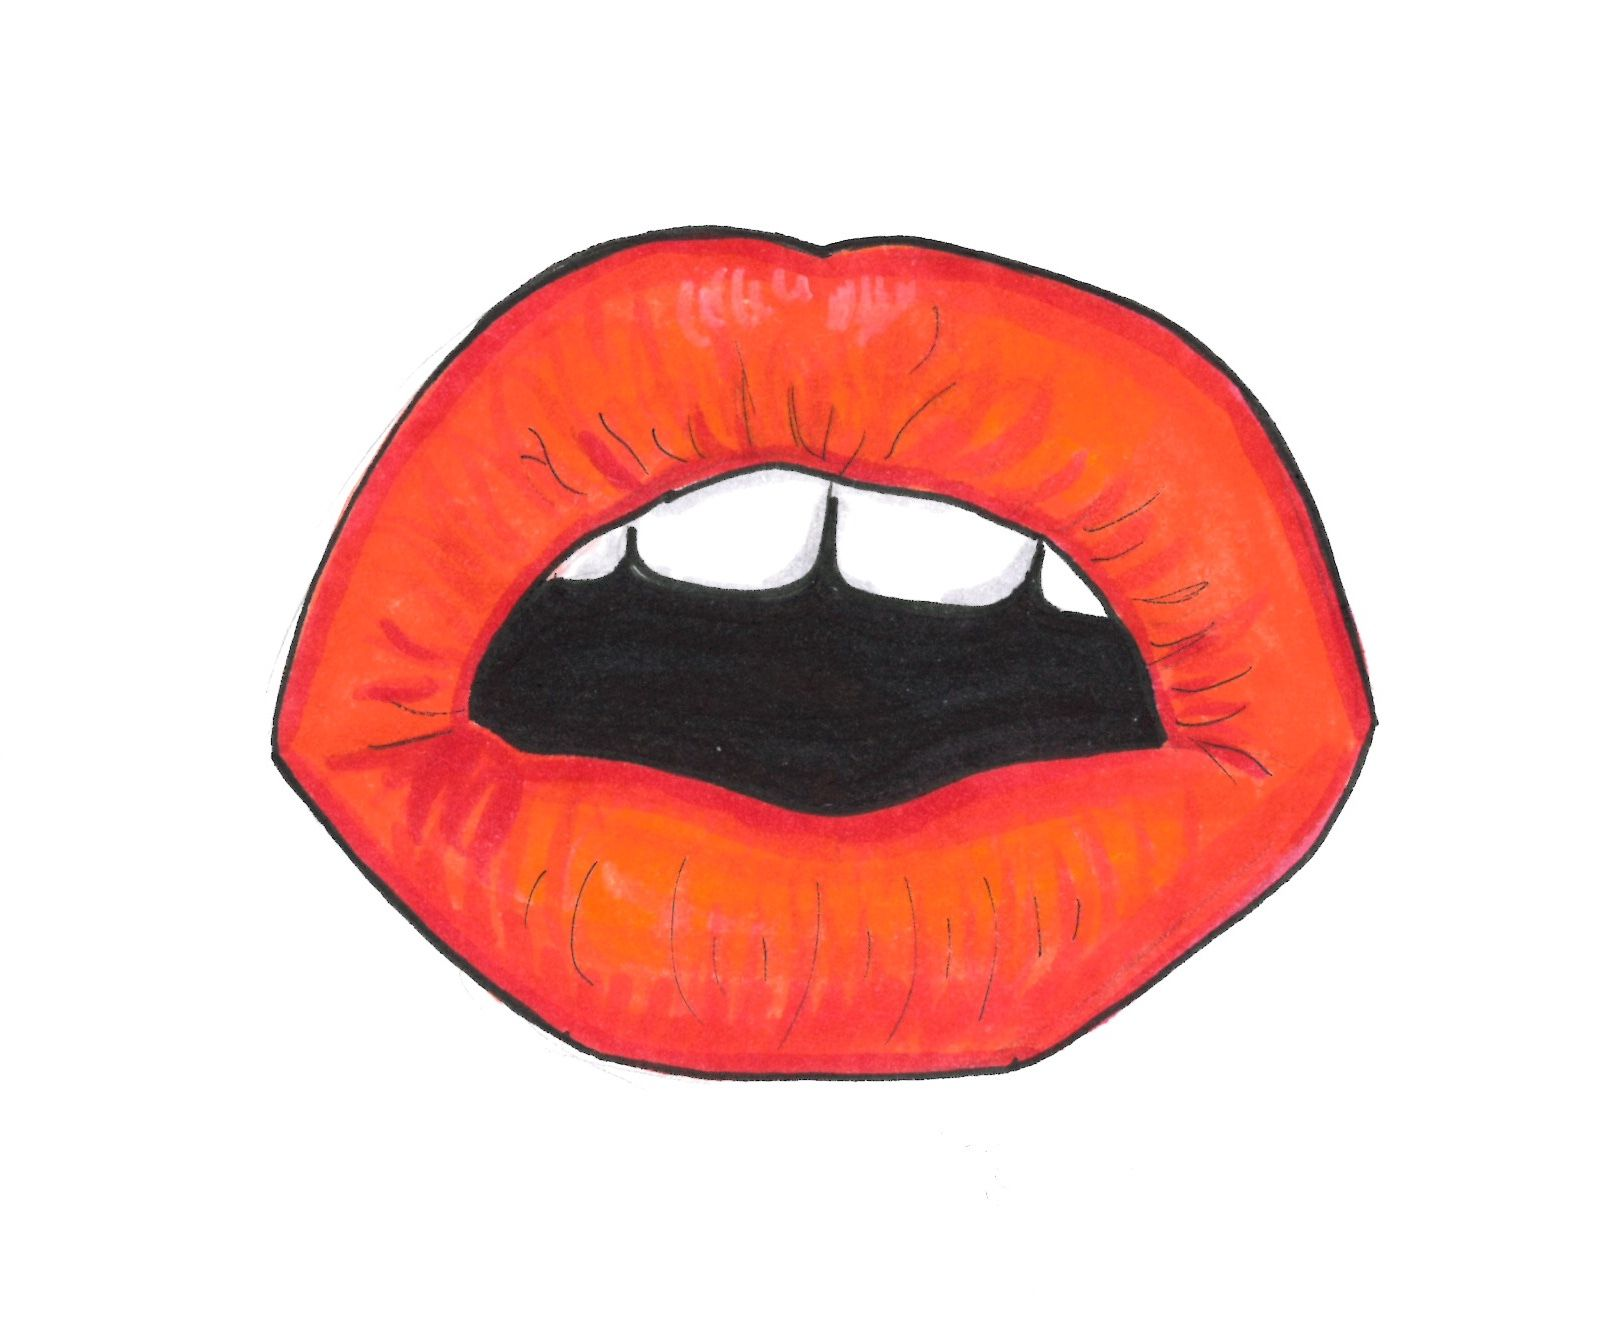 mounth sketch love mounth girl artofbea volidifantasia love